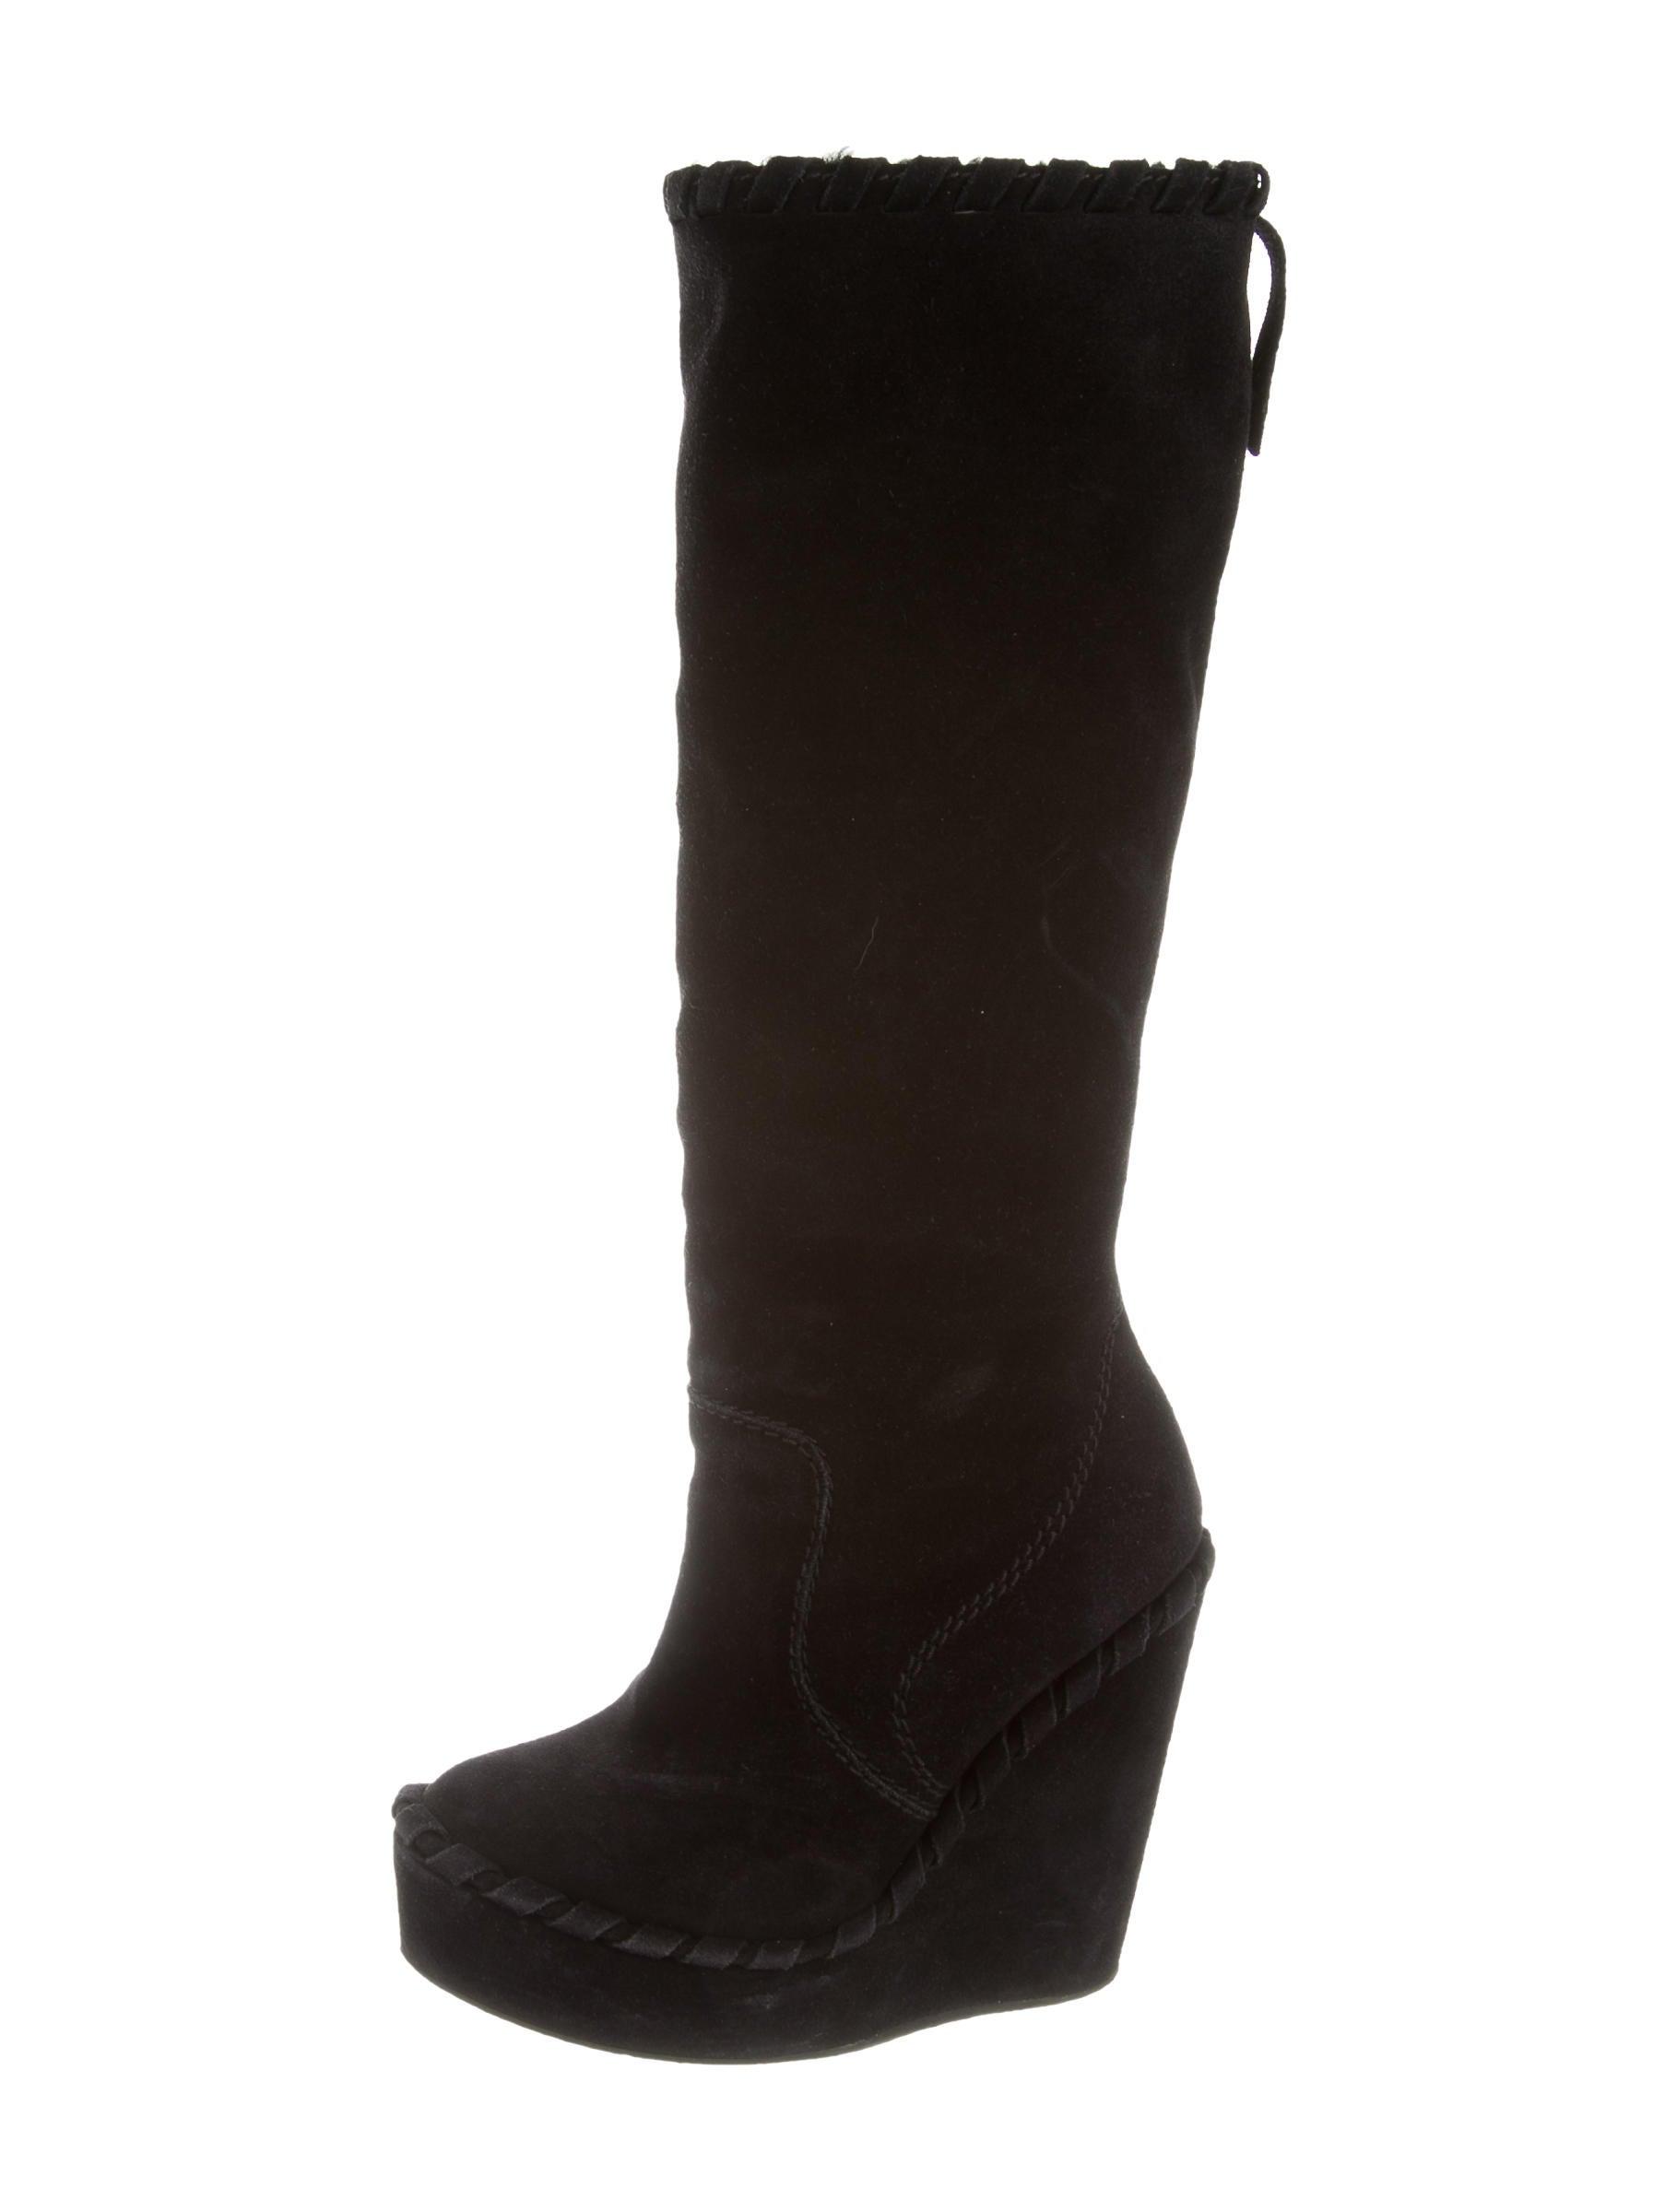 pedro garcia suede platform boots shoes ped23292 the